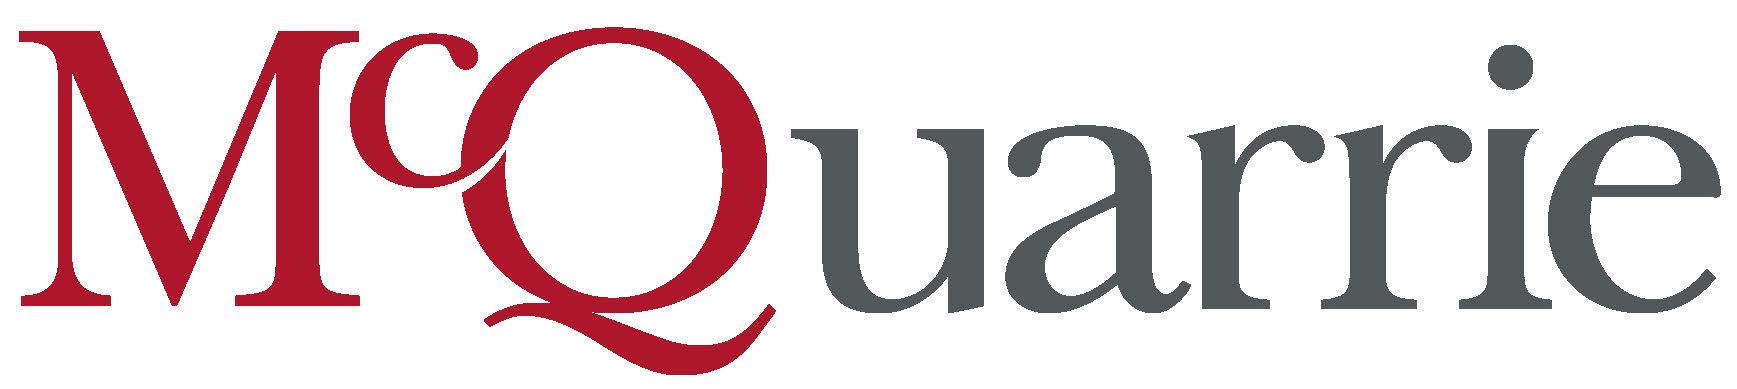 McQuarrie-Logo-(Pantone-Color).jpg